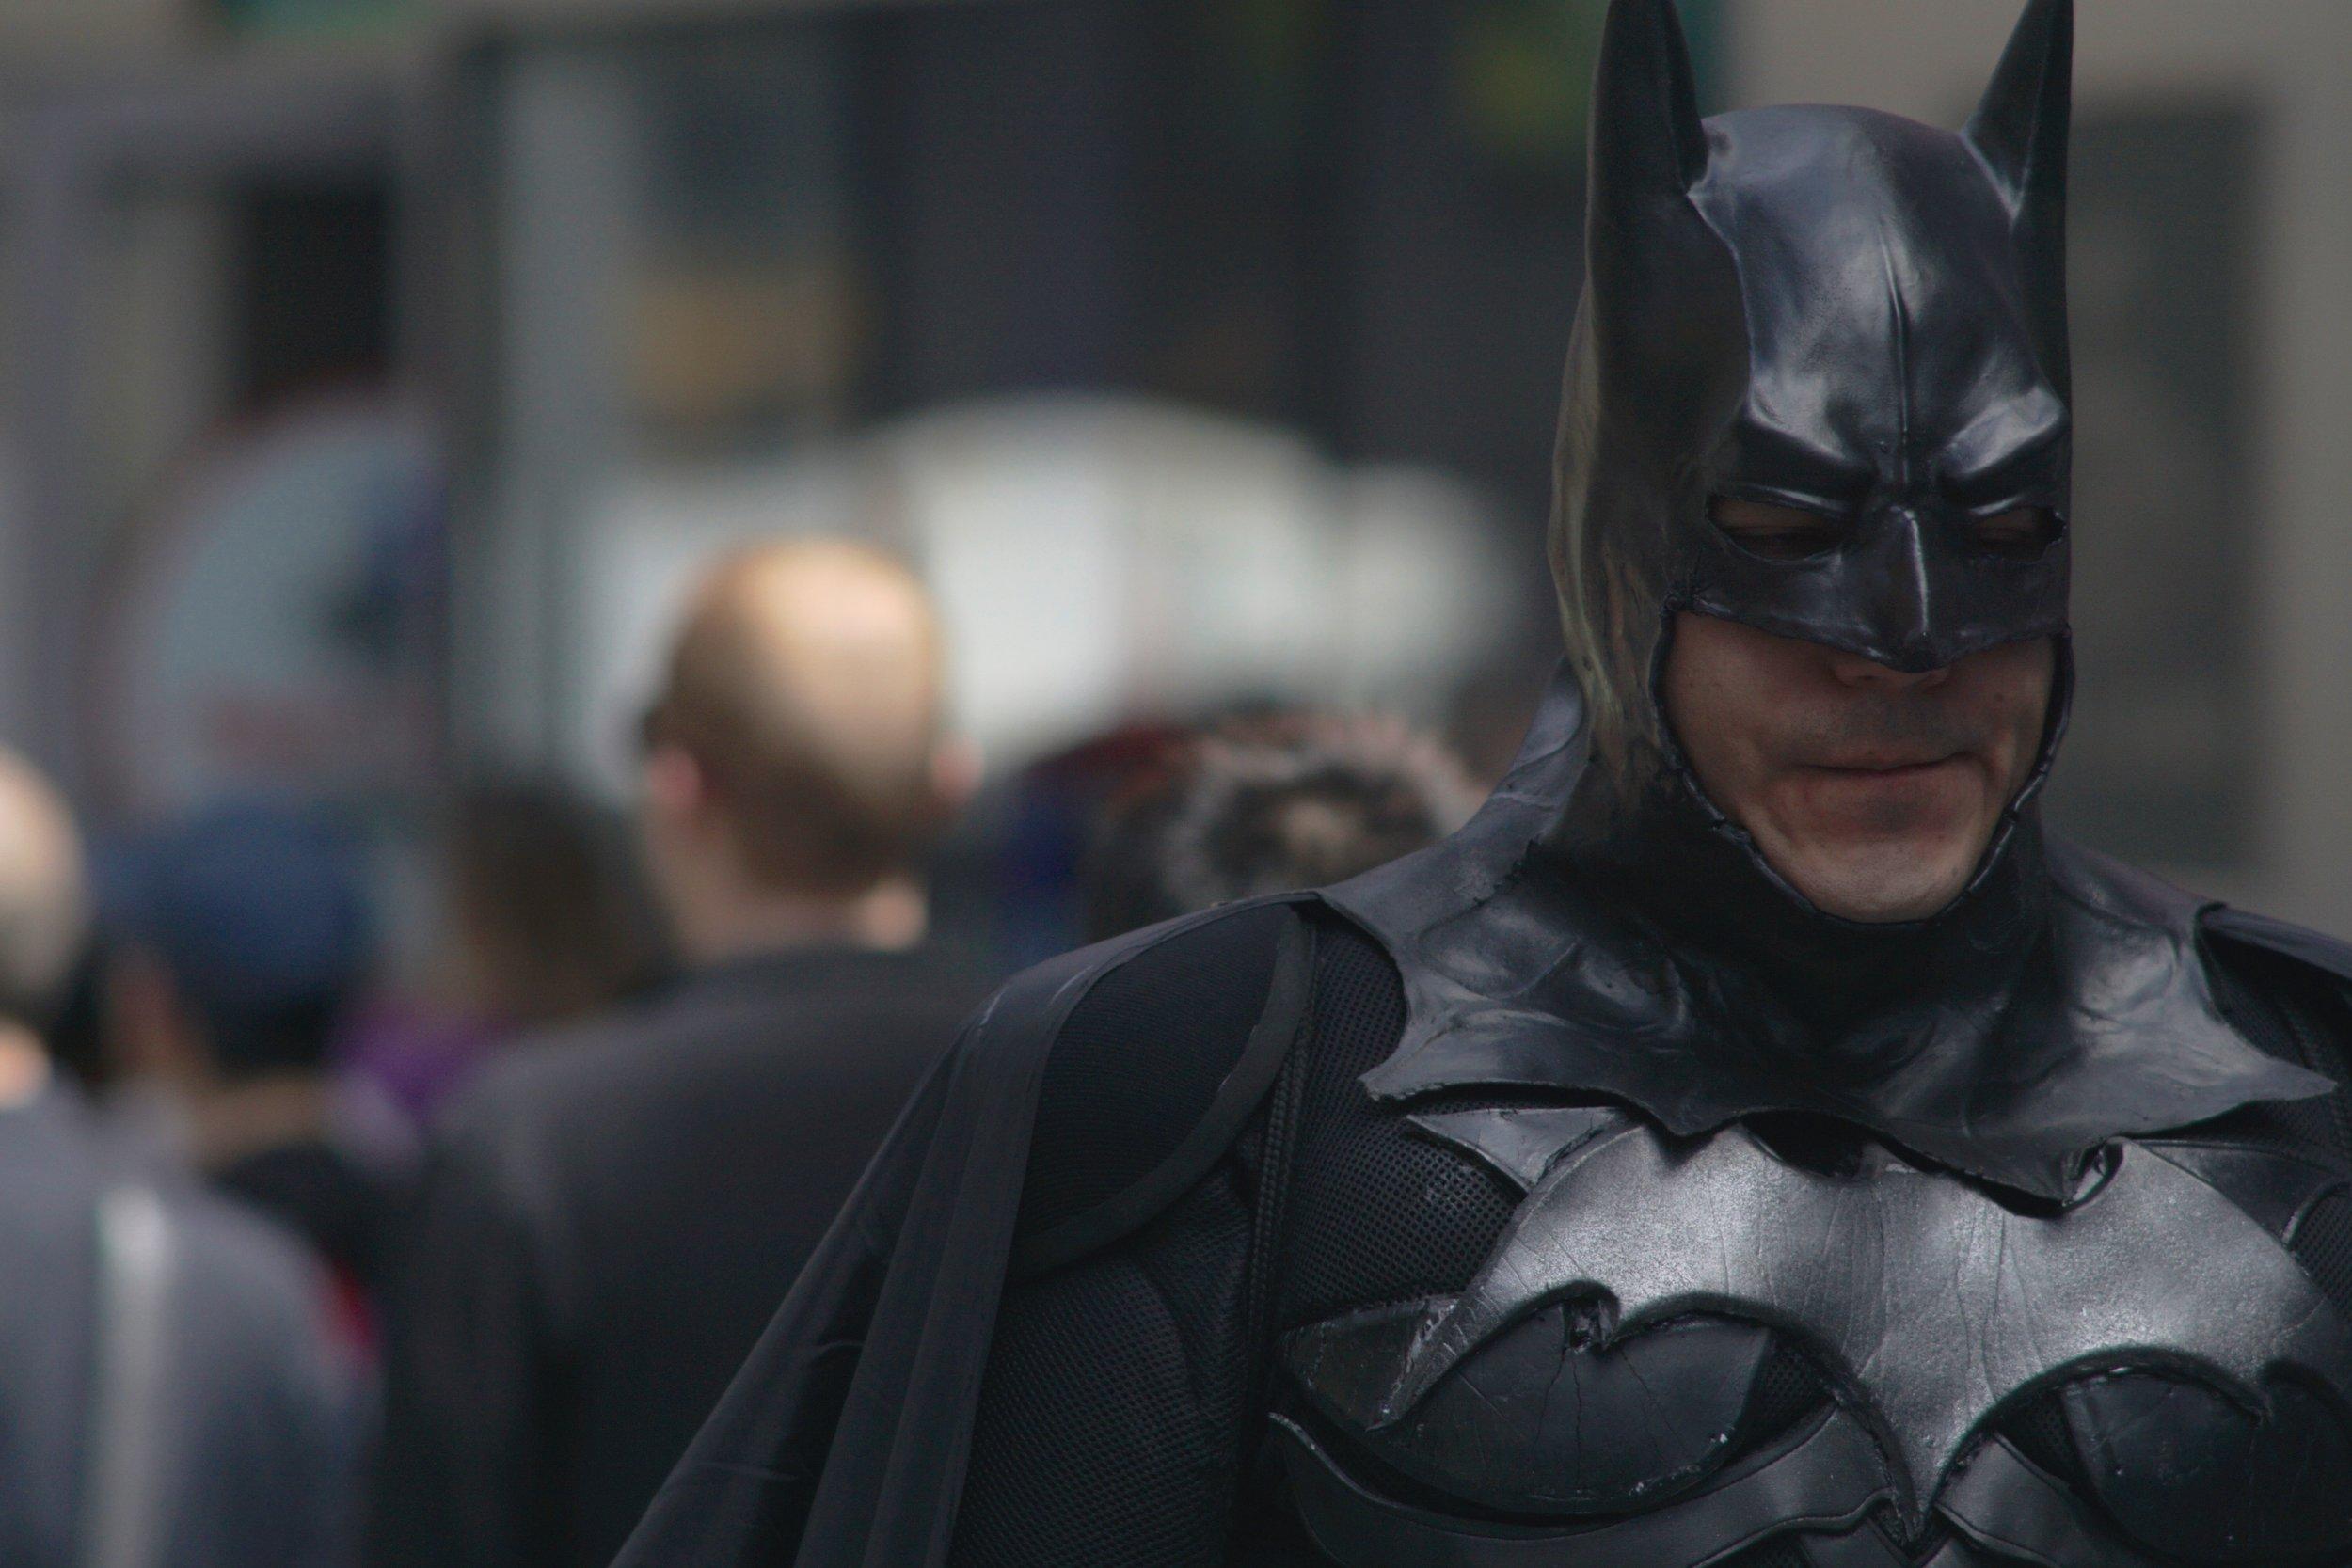 Street Photography with A Telephoto Lens, batman!